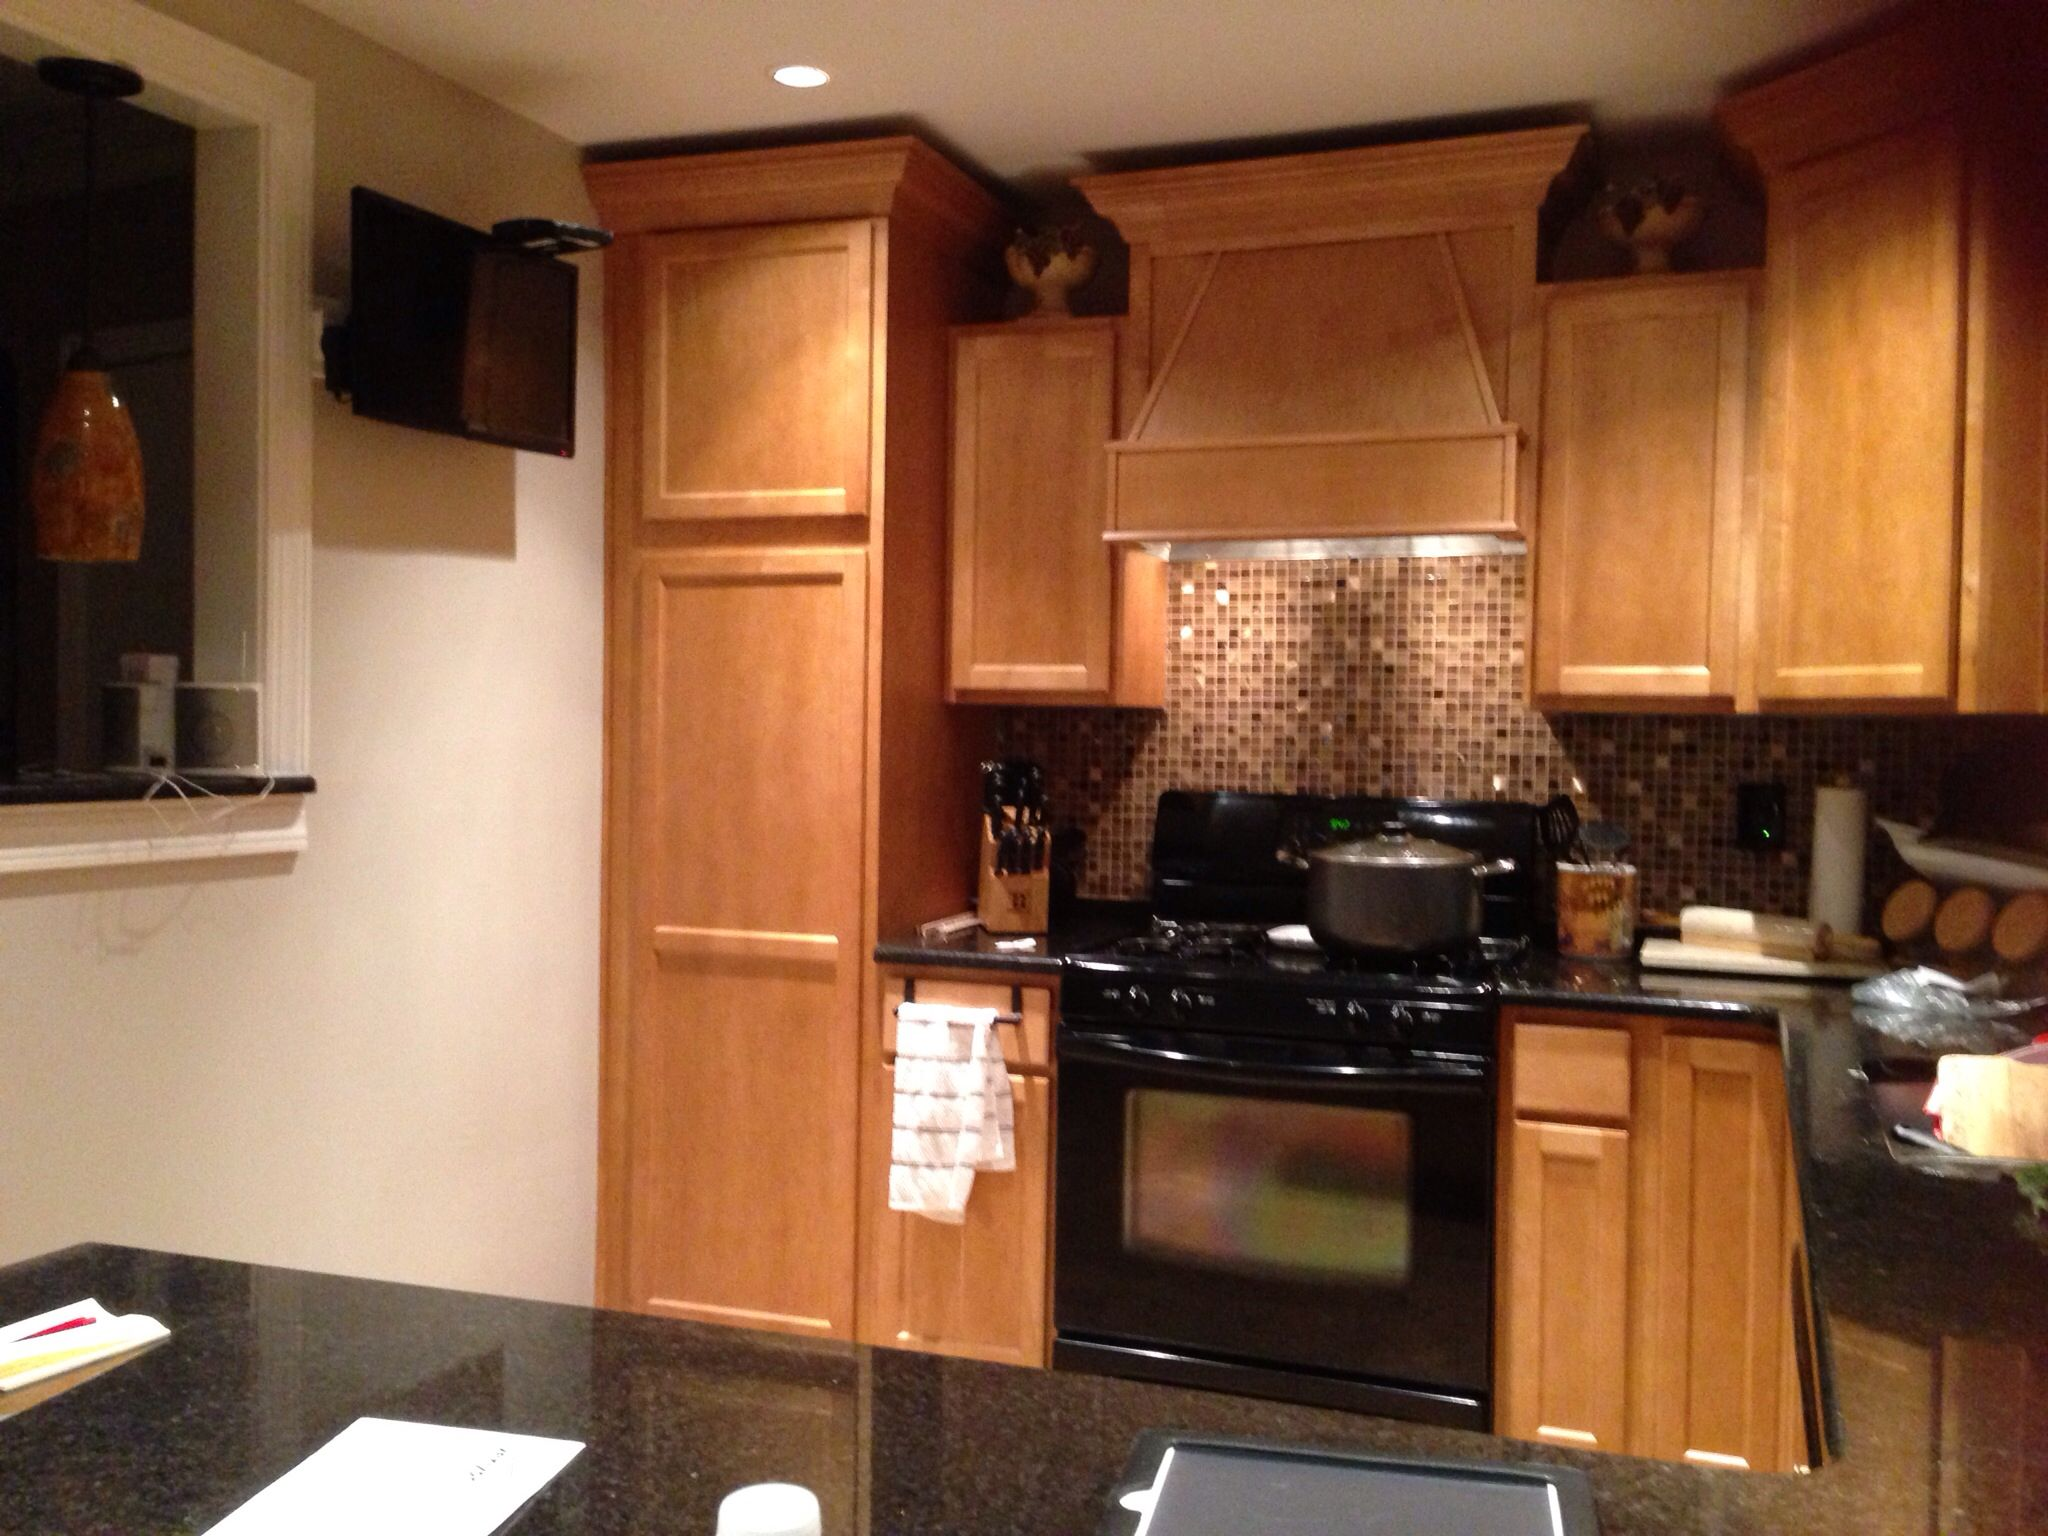 Pinterest inspired backsplash the finishing touch to my new kitchen